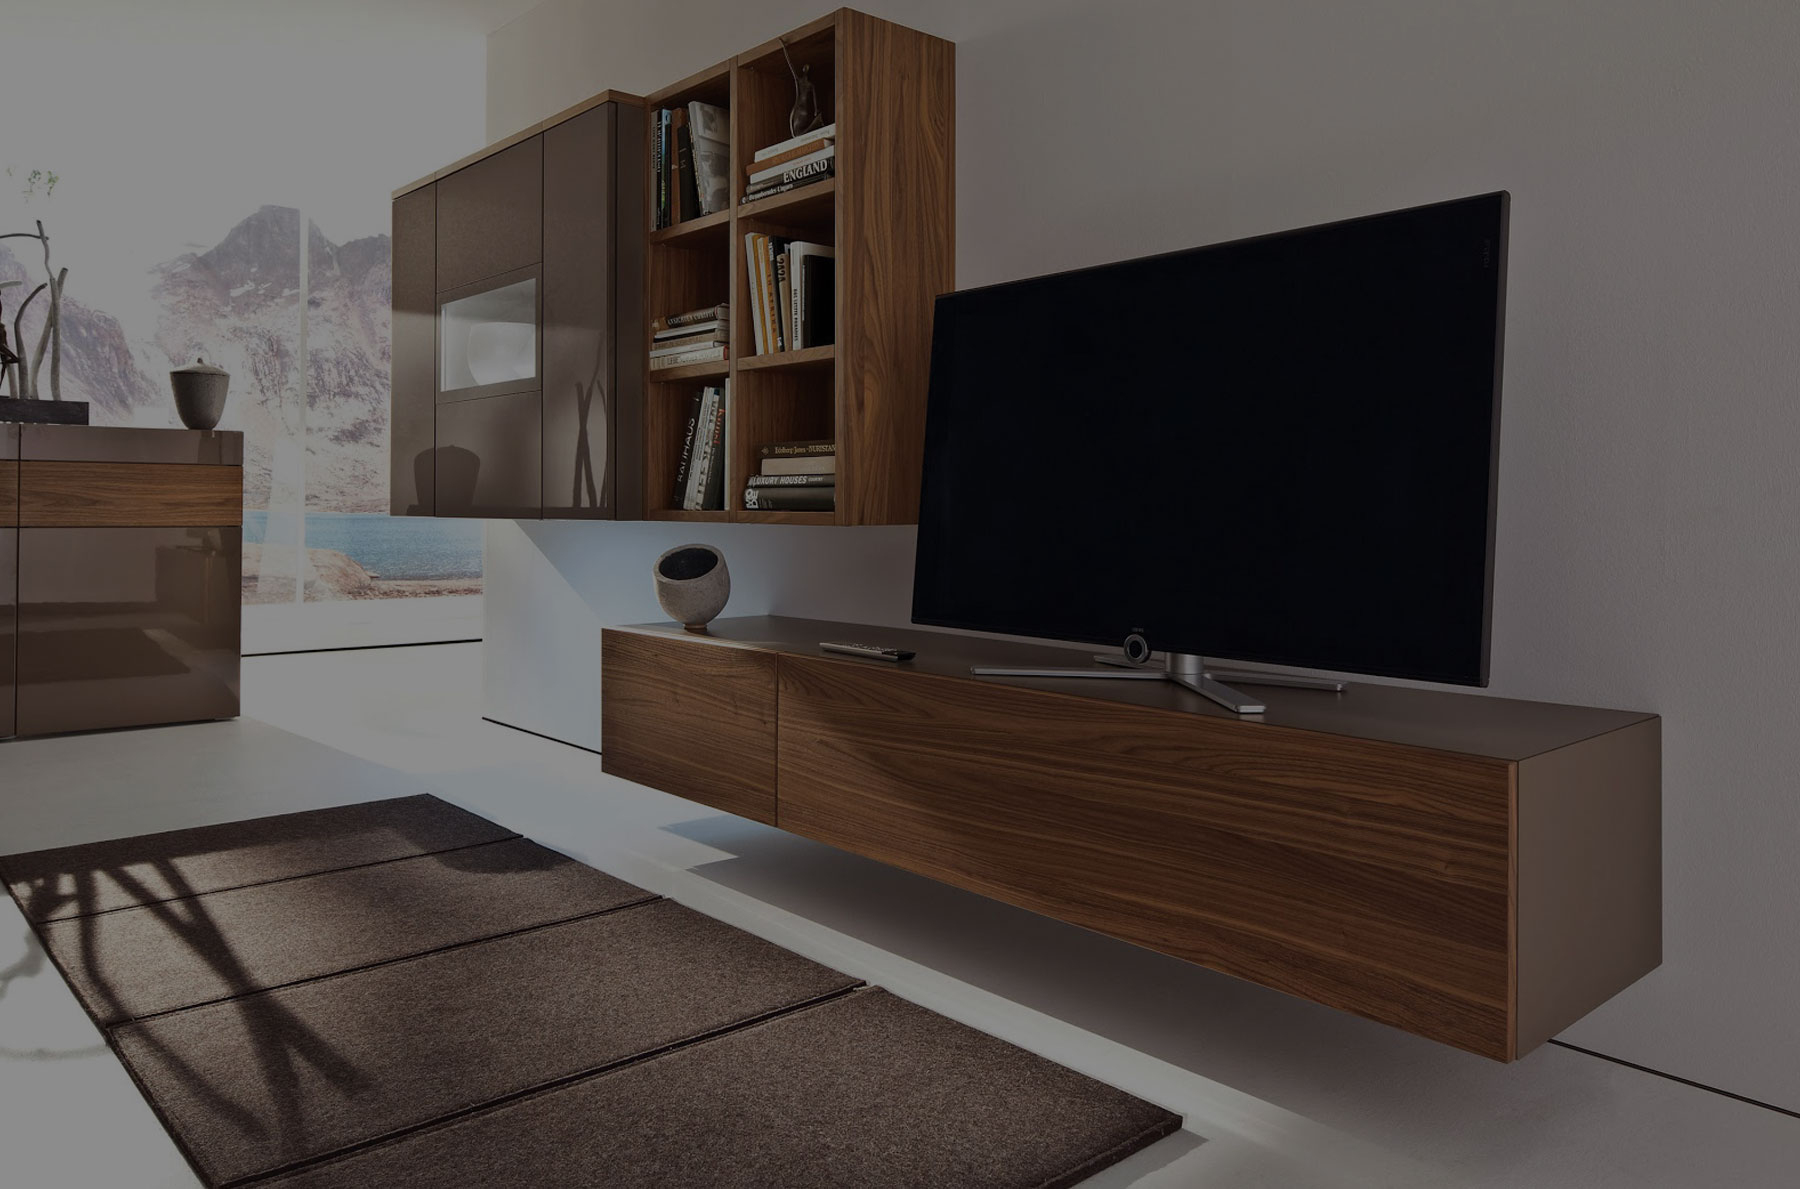 Meuble Tv Design Italien Haut De Gamme - Novocom.top serapportantà Meuble Tv Mural Design Italien